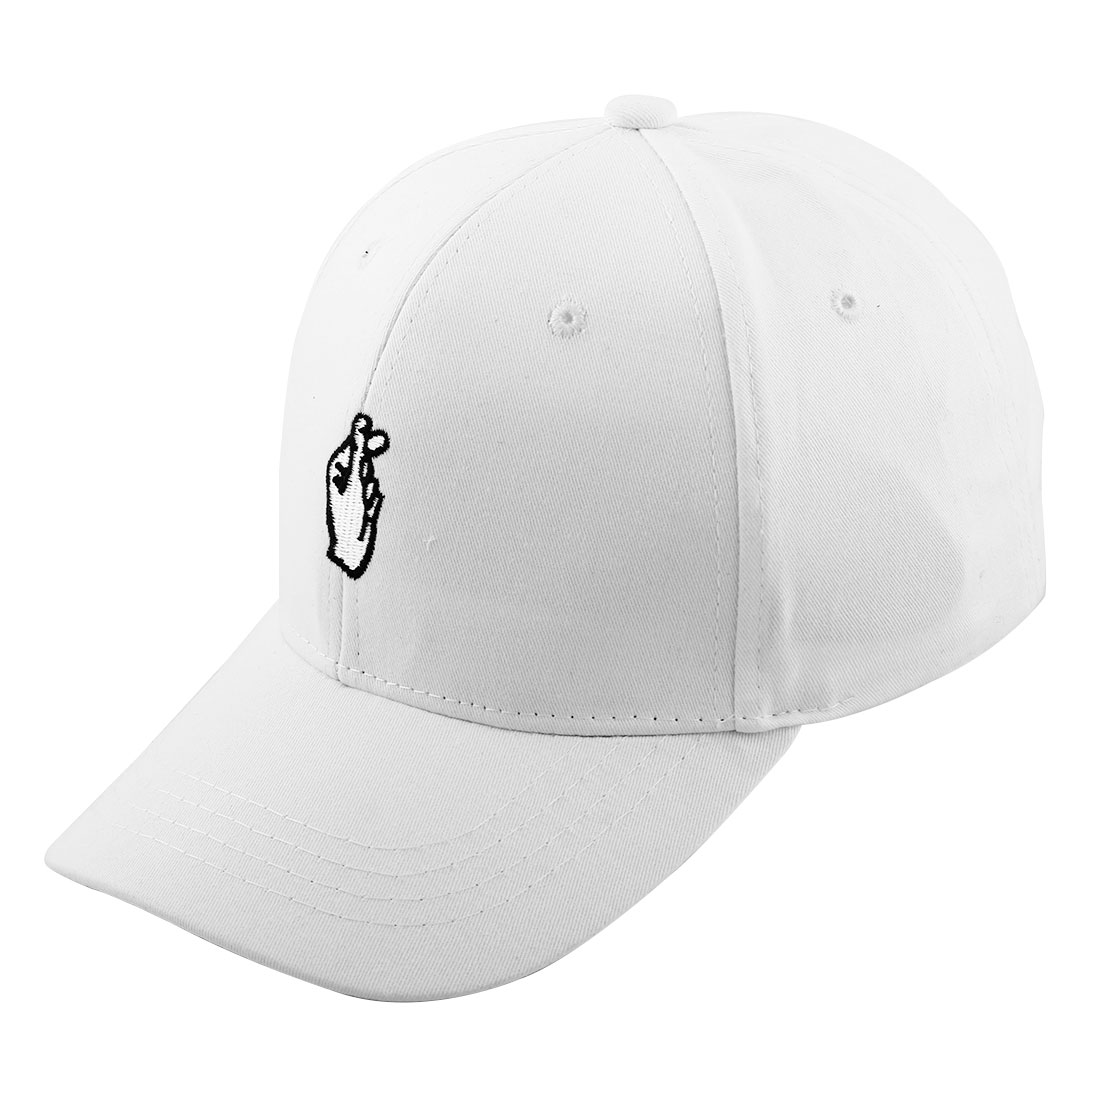 Unisex Cotton Blends Love Gestures Outdoor Tennis Adjustable Baseball Sun Visor Hat Cap White